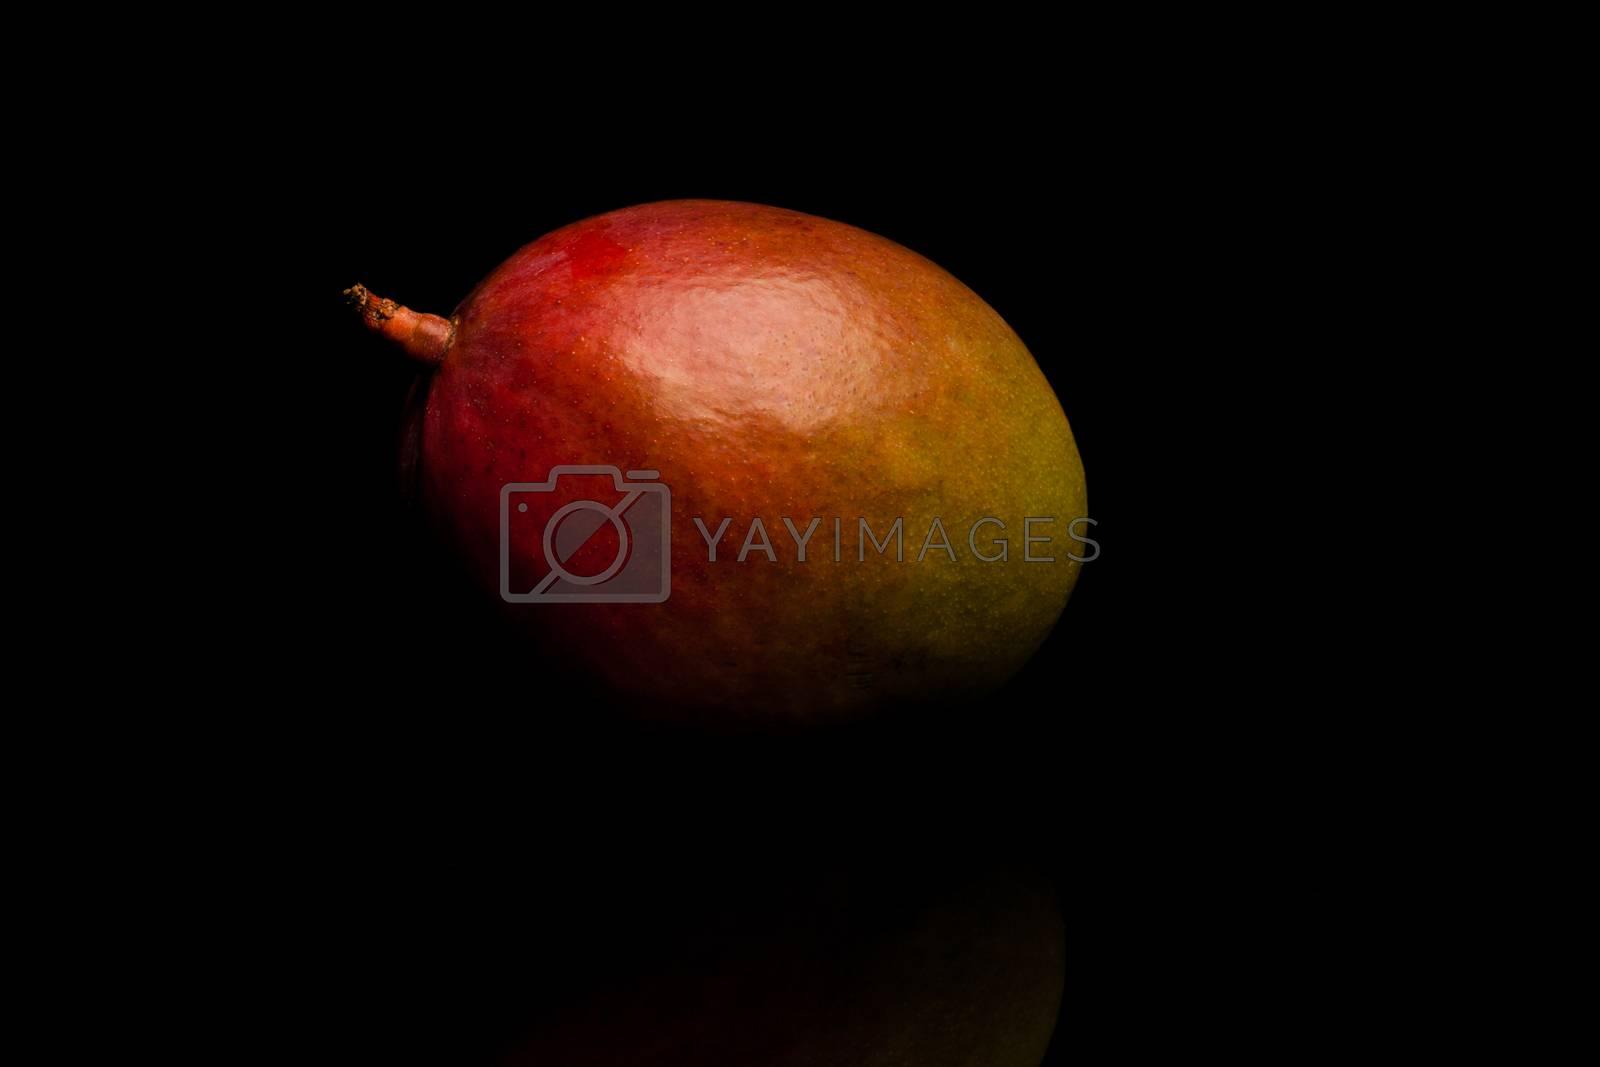 Royalty free image of Mango by furo_felix